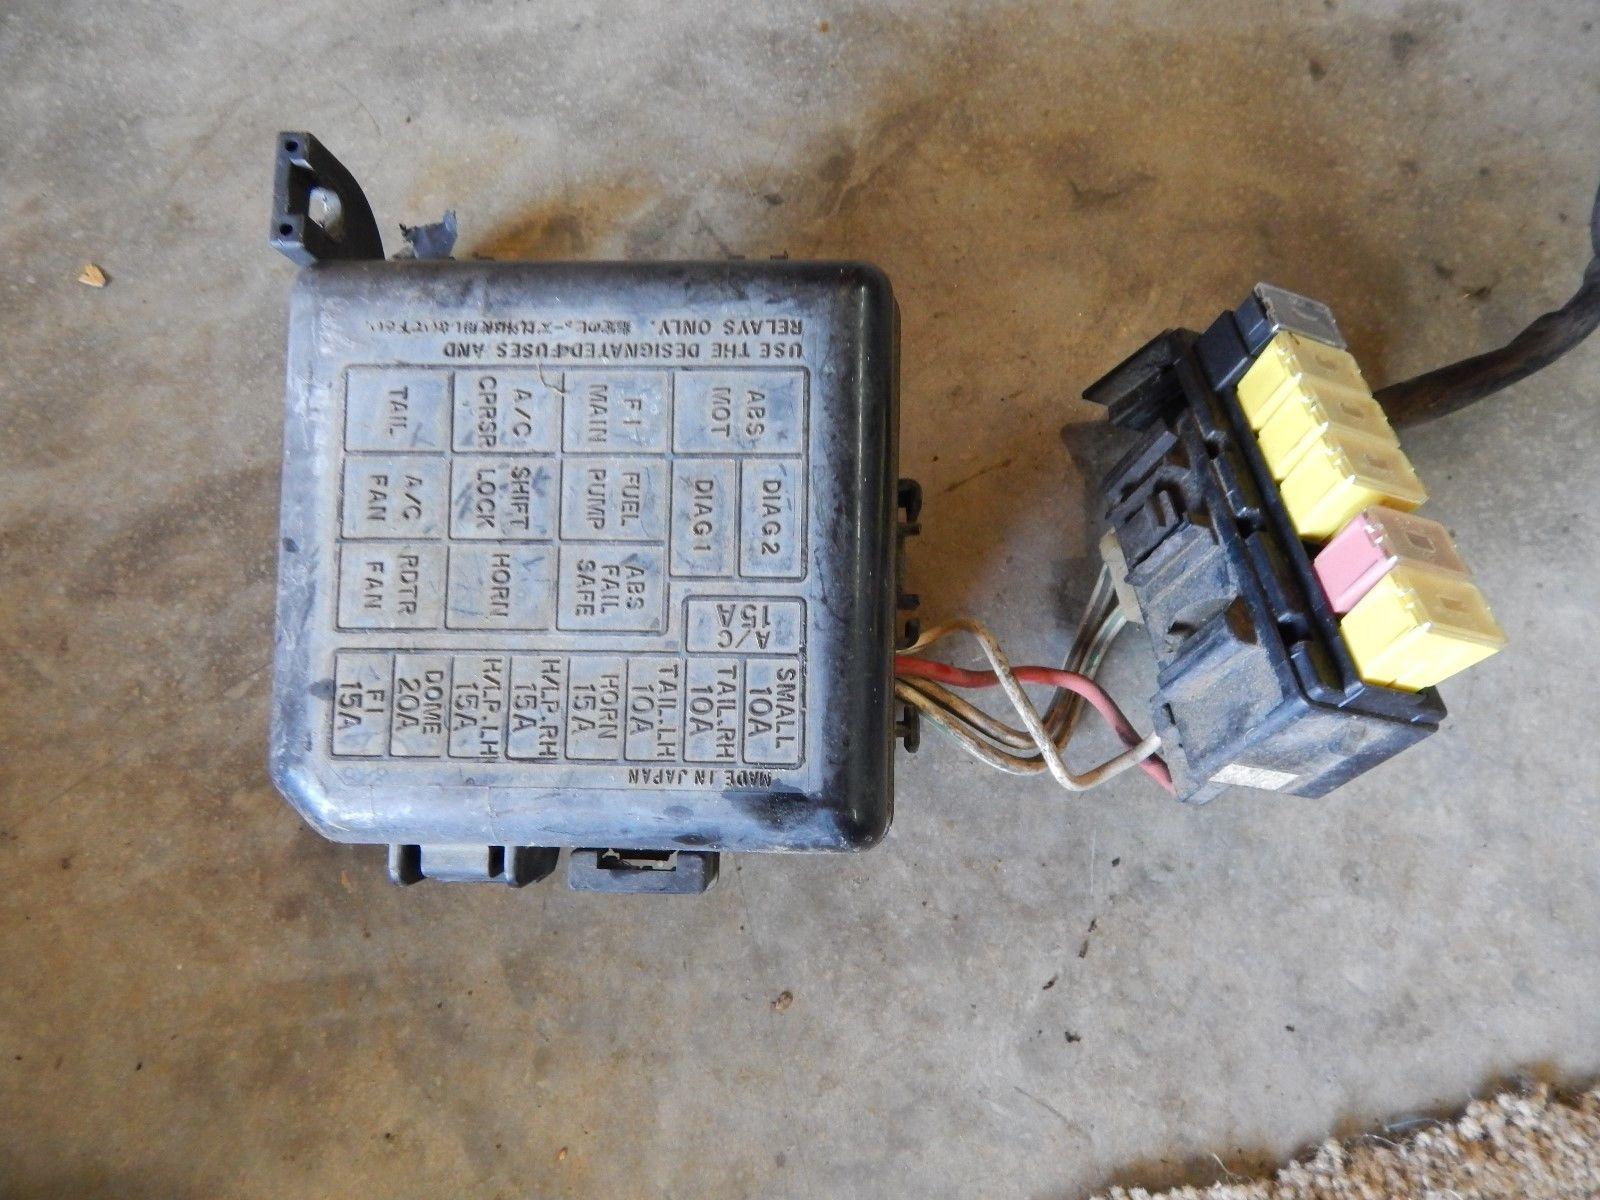 [DIAGRAM_5NL]  XF_0501] 1998 Suzuki Esteem Fuse Box Diagram Wiring Diagram | Fuse Box Diagram Suzuki Esteem |  | Wedab Vell Waro Hendil Mohammedshrine Librar Wiring 101